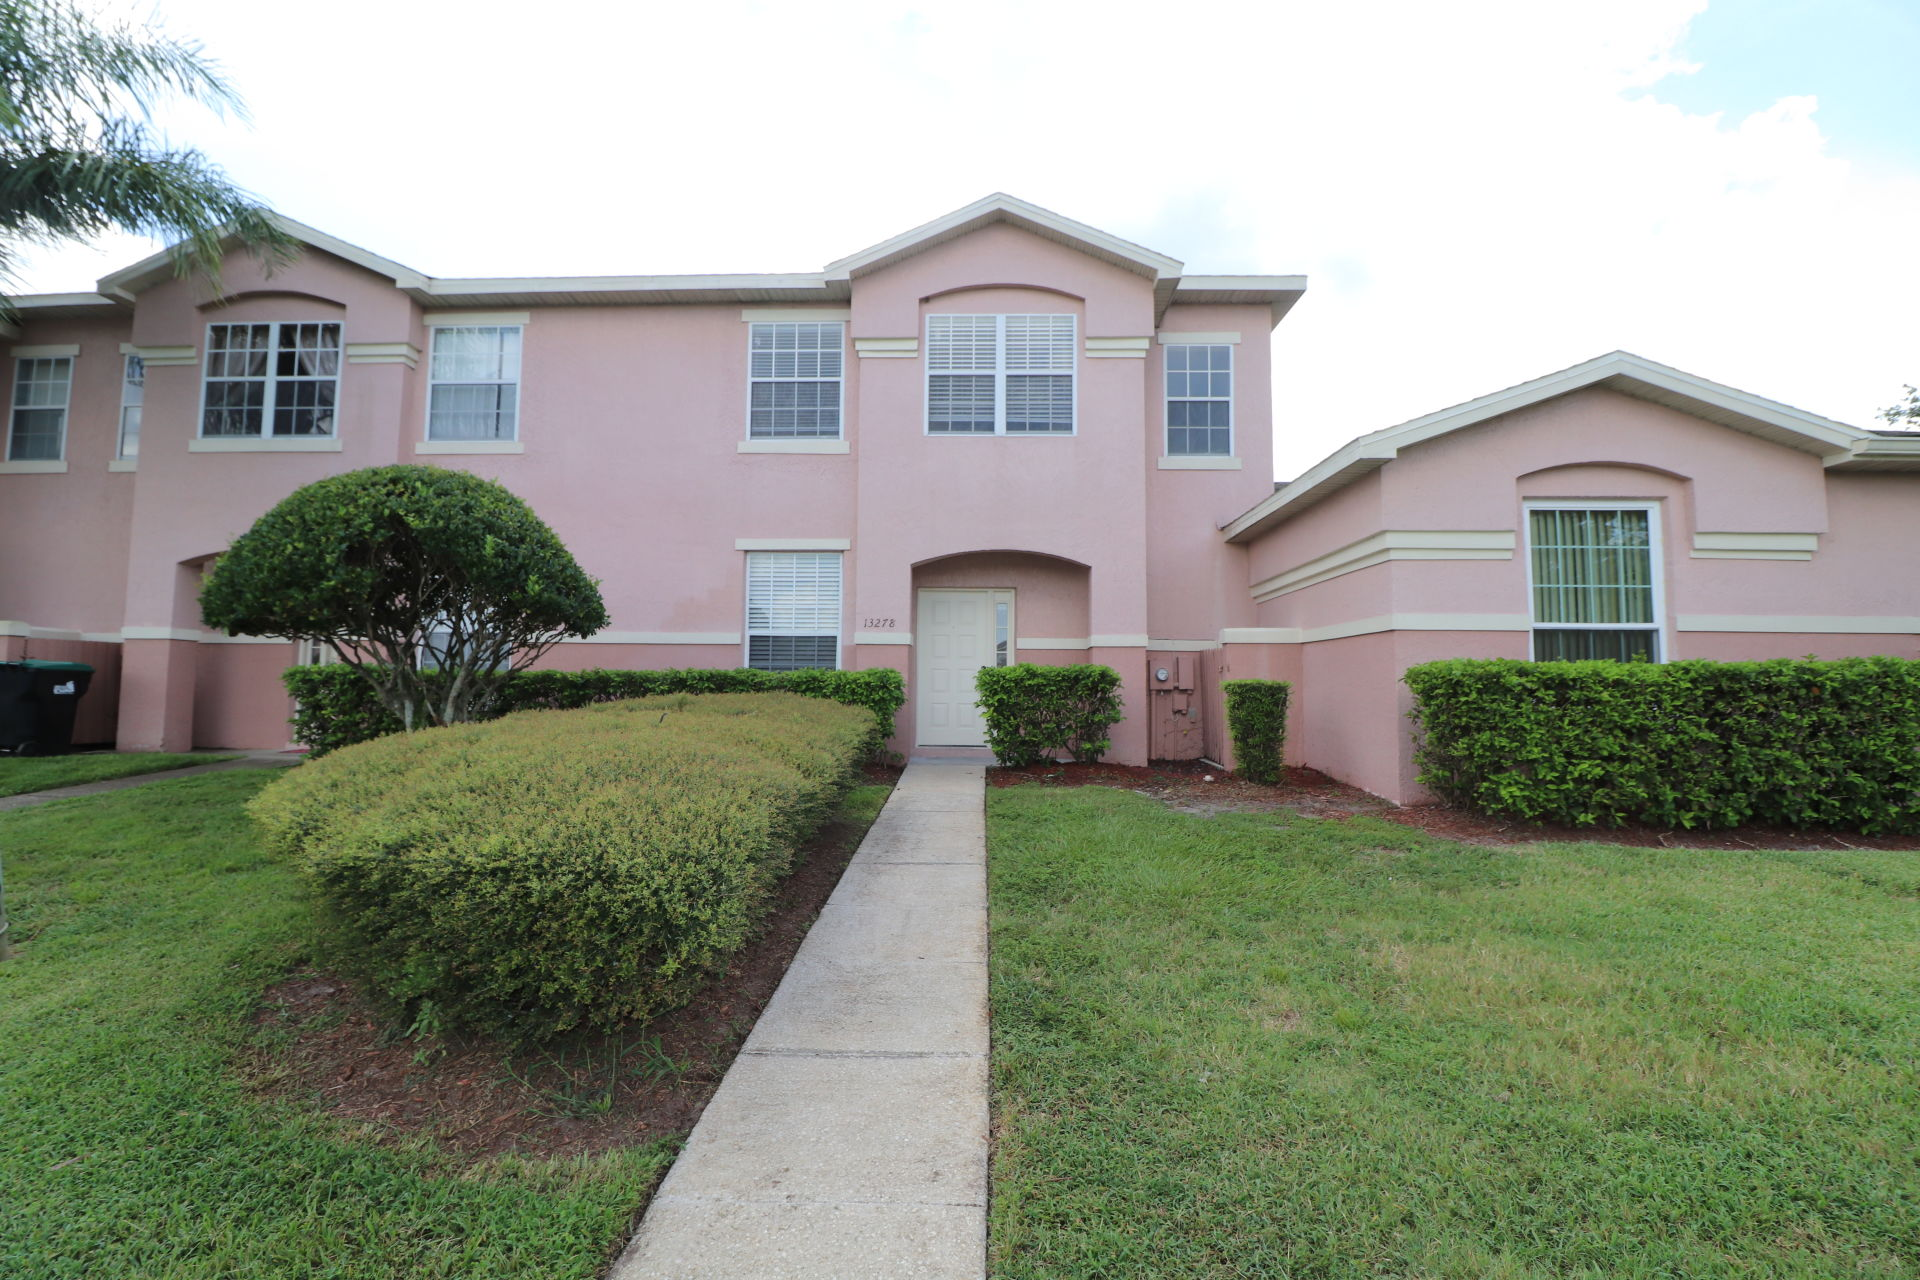 13278 SUMMERTON DR, ORLANDO, FL 32824